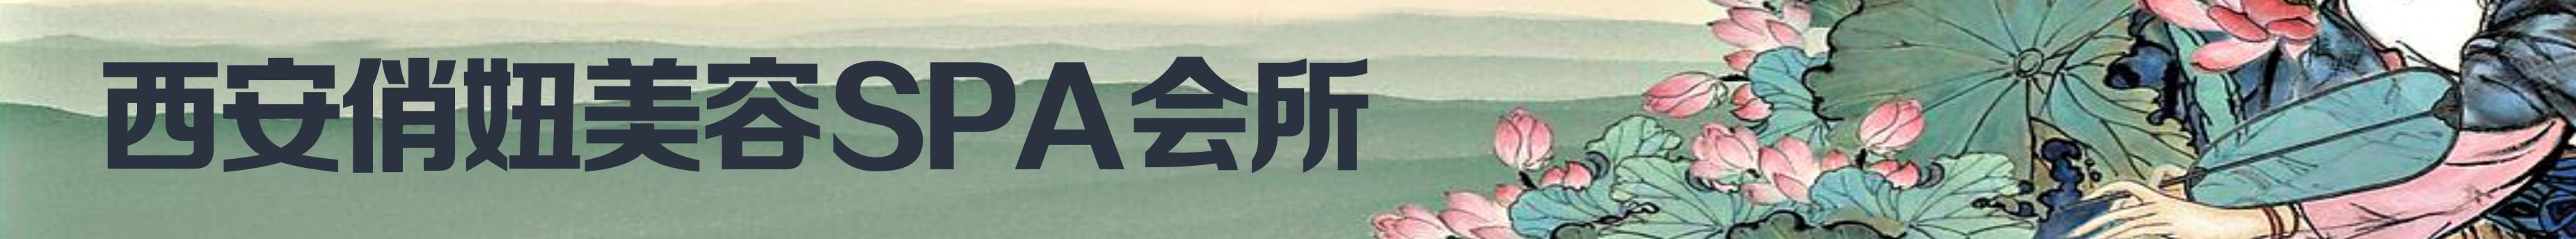 http://p2.pccoo.cn/vote/20150330/2015033010202638869045.jpg